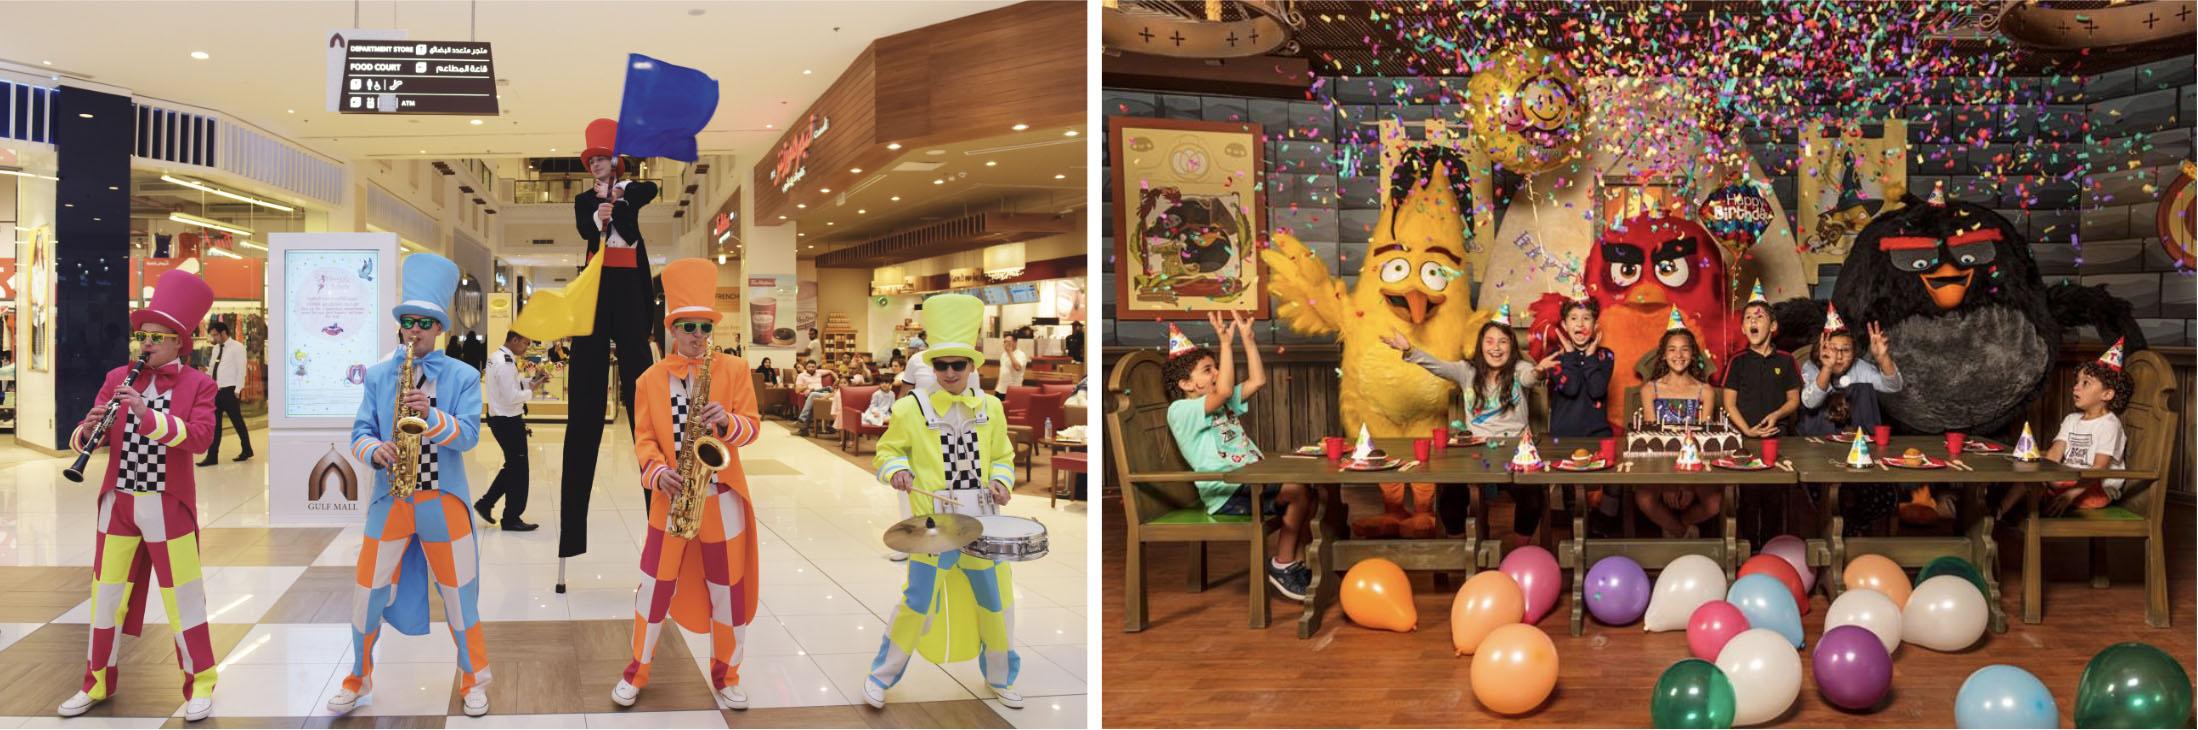 Qatar Entertainment City